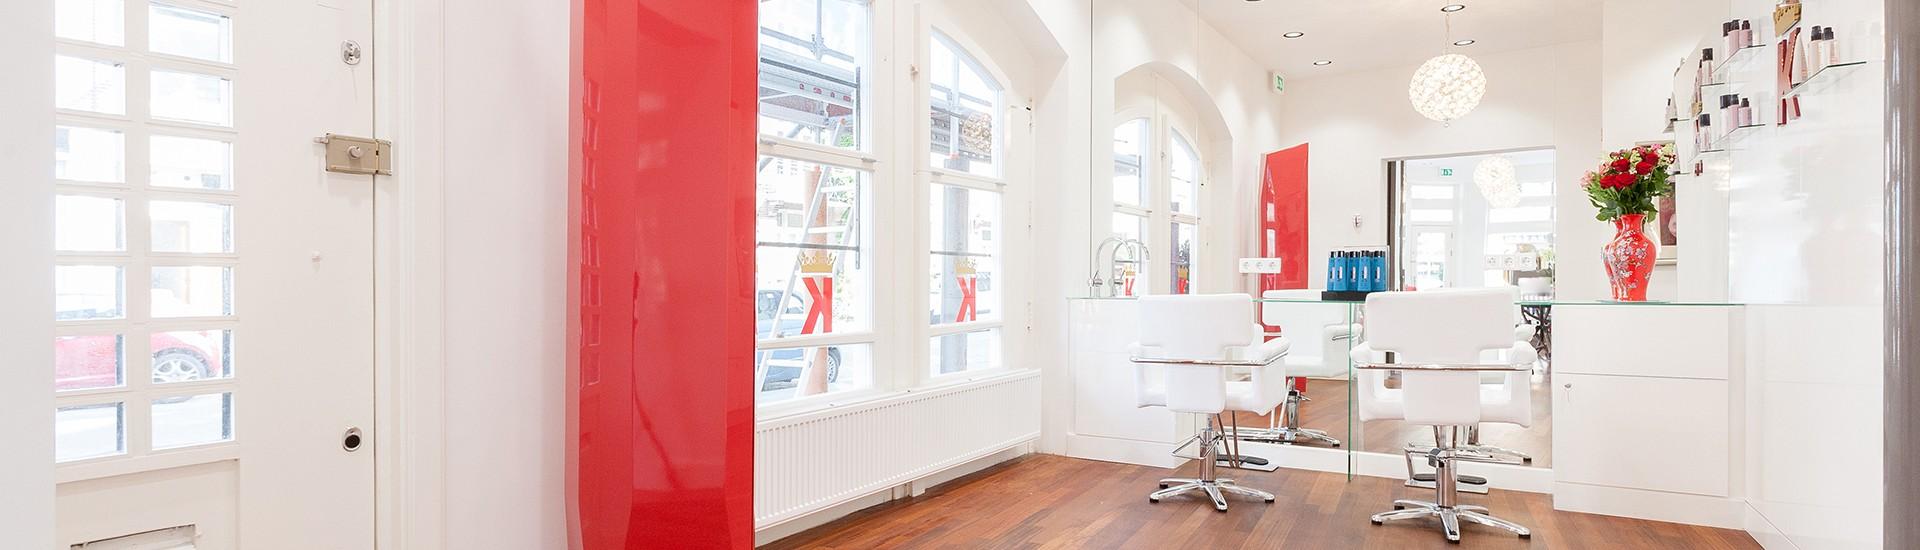 Kbal-hairstylist-Kapsalon-Amsterdam-interieur01